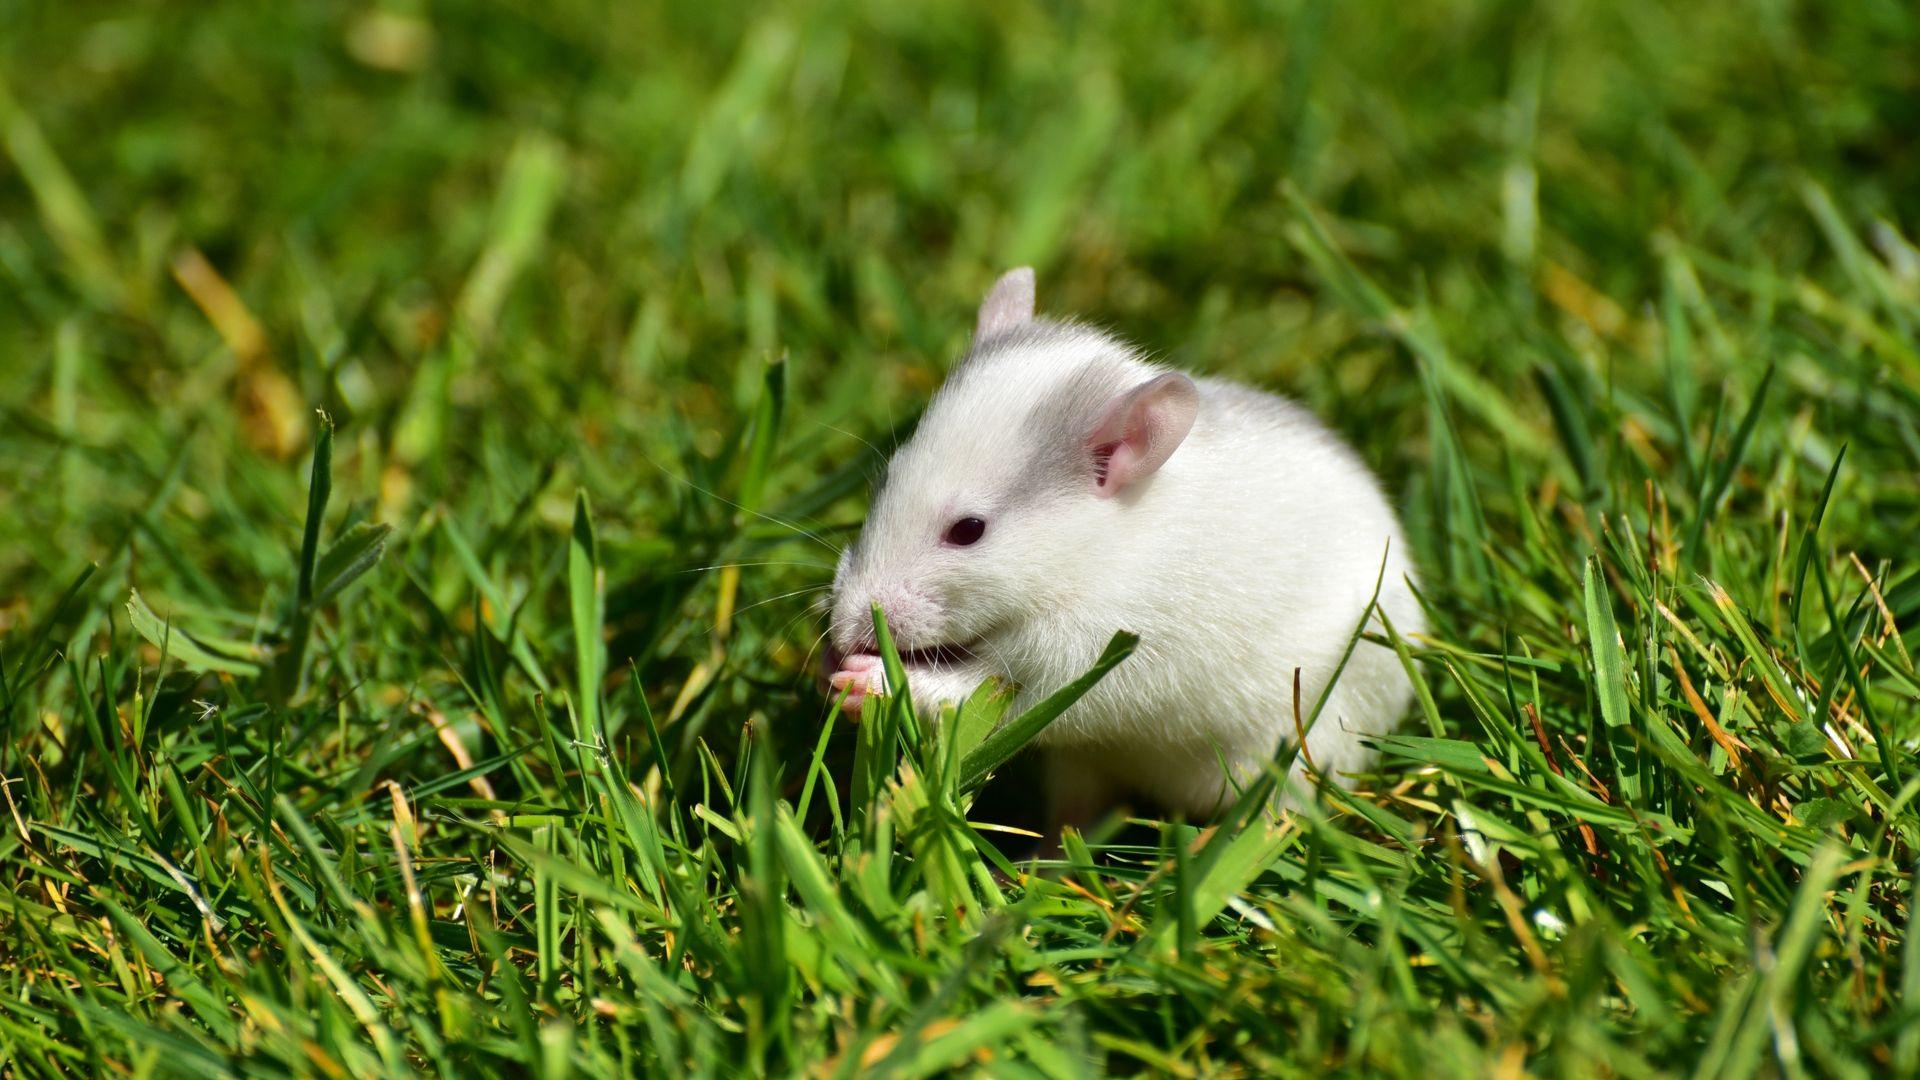 White Metal Rat full hd 1080p wallpaper